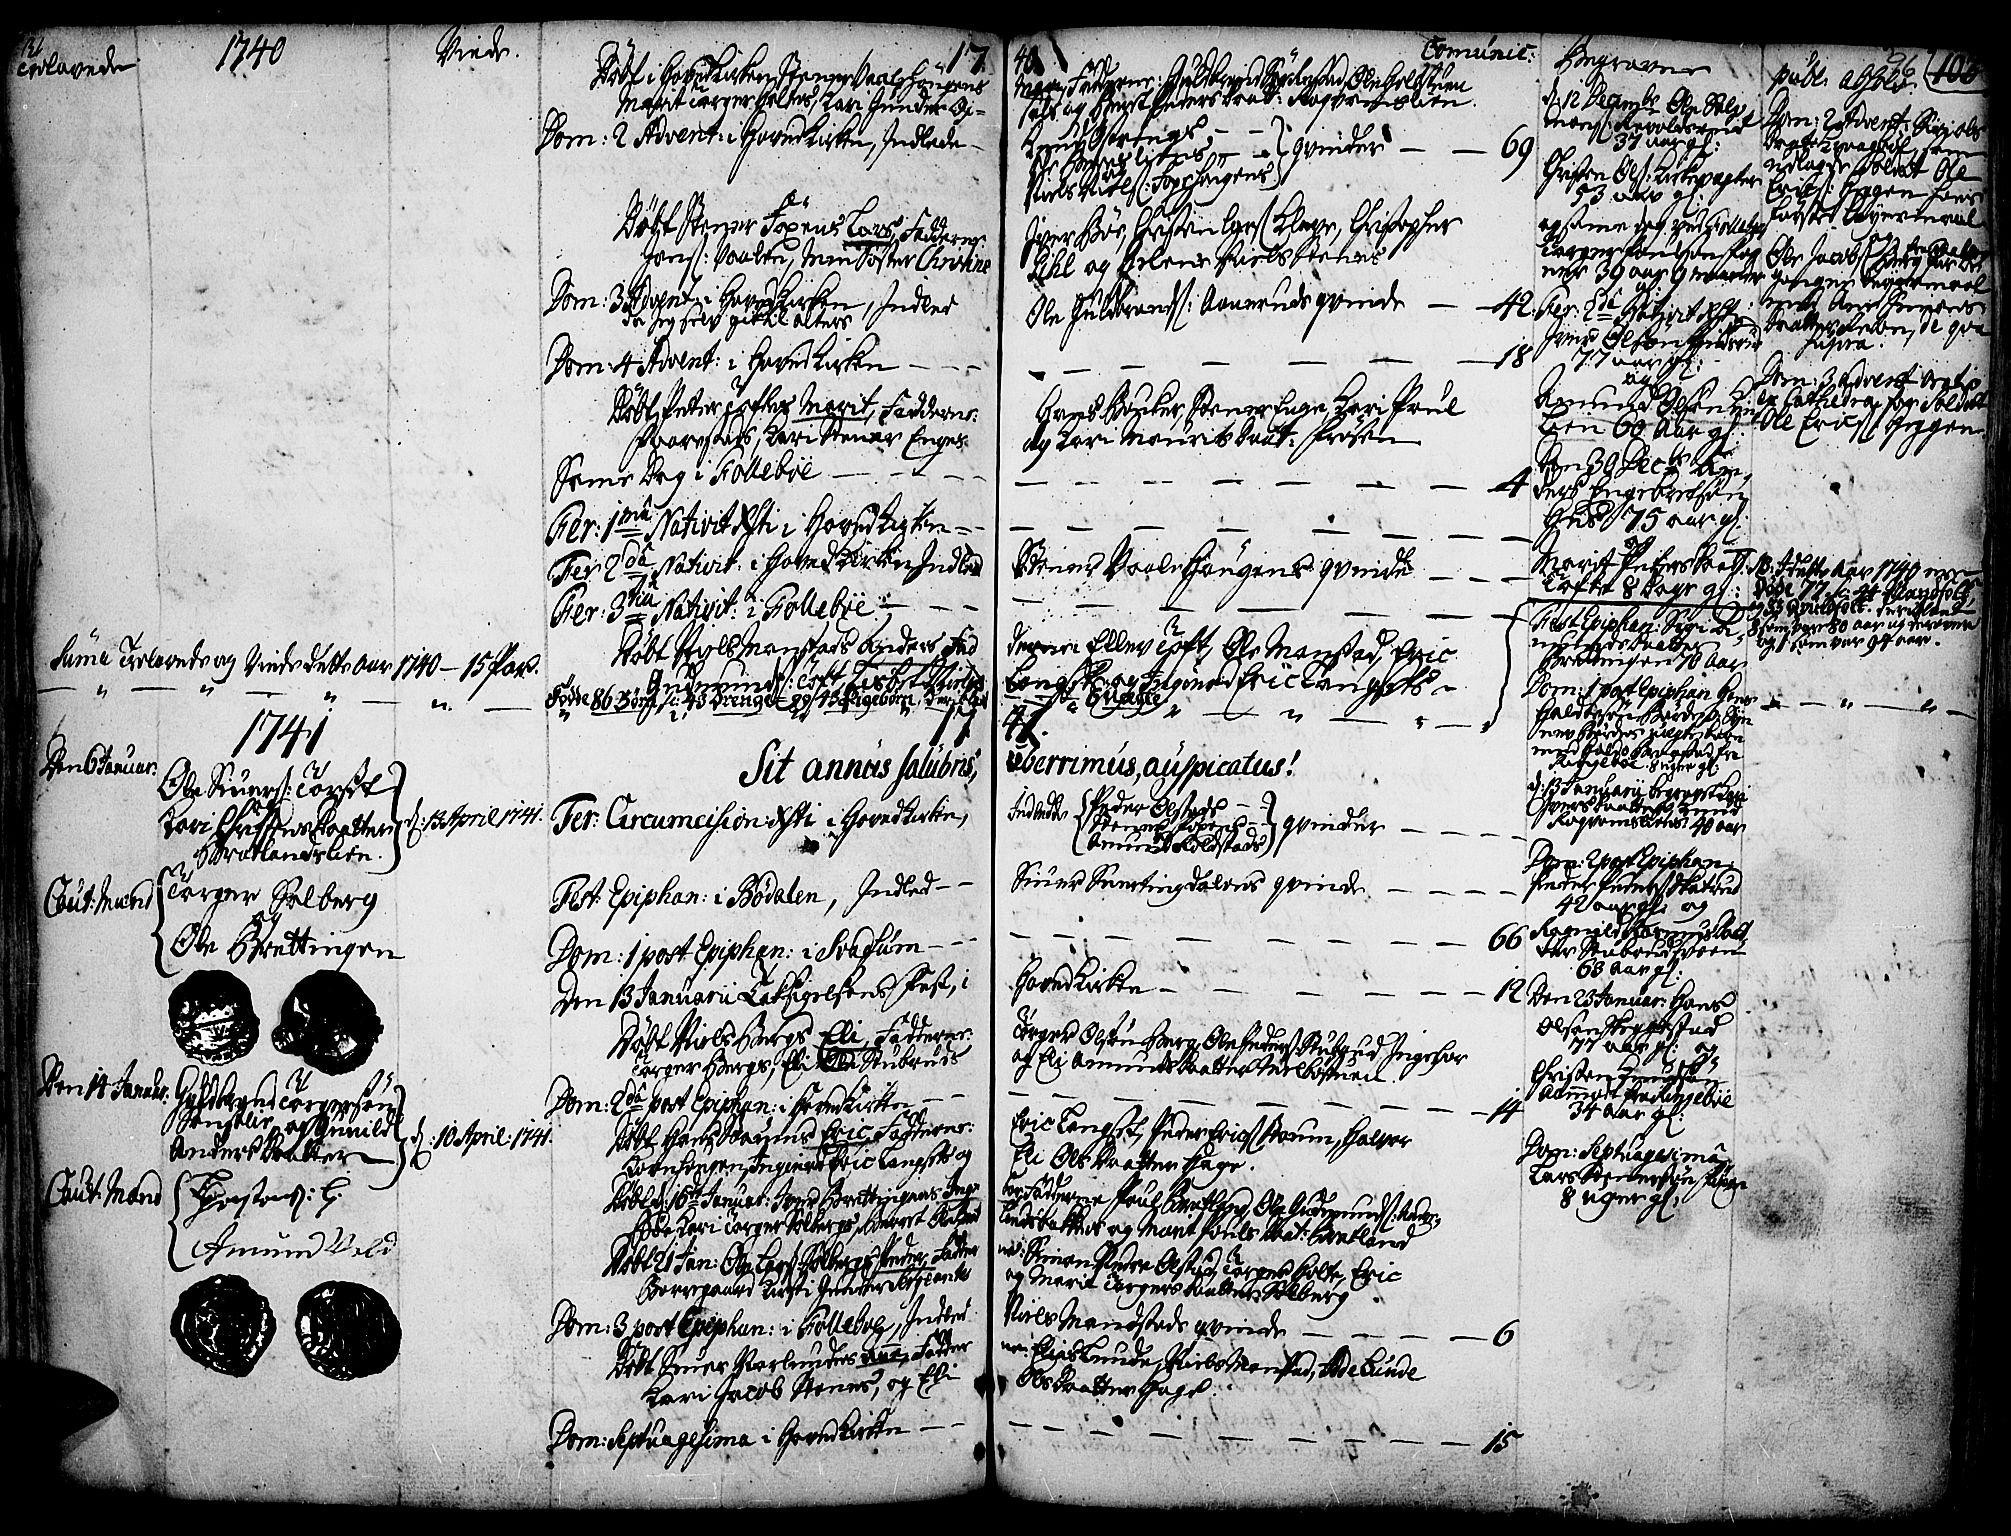 SAH, Gausdal prestekontor, Ministerialbok nr. 2, 1729-1757, s. 96